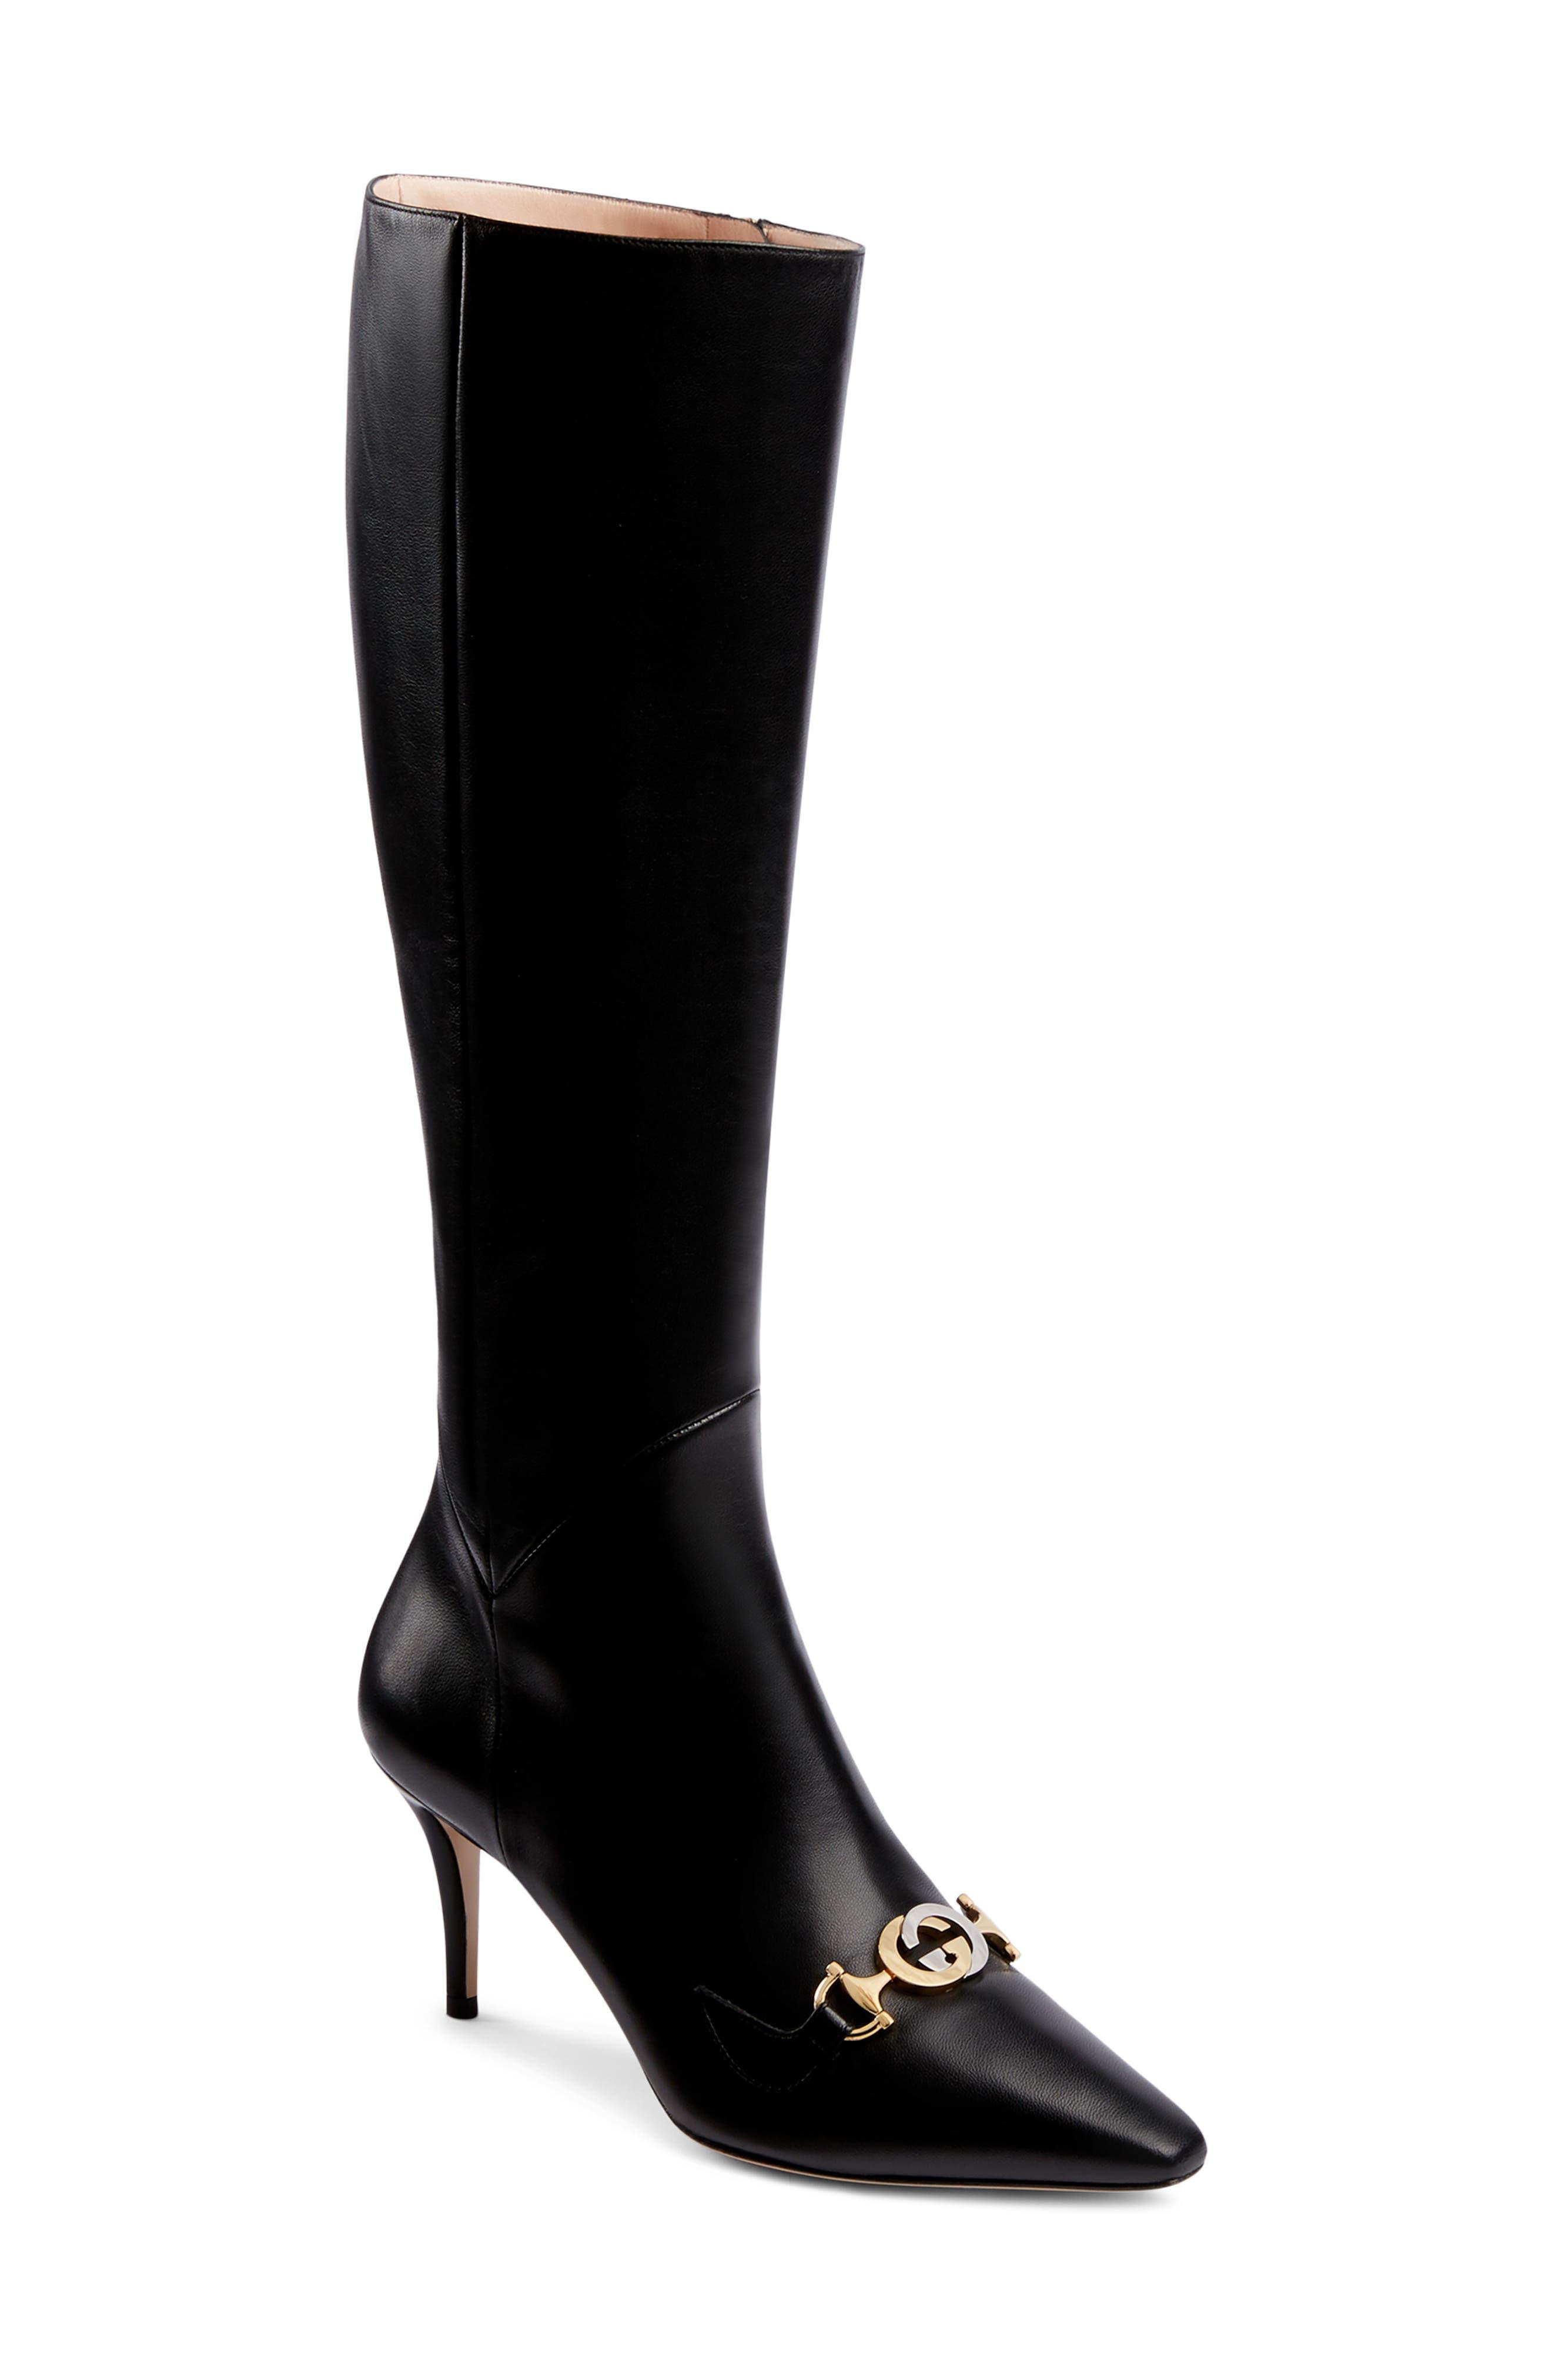 Gucci Zumi Knee High Boot, Black